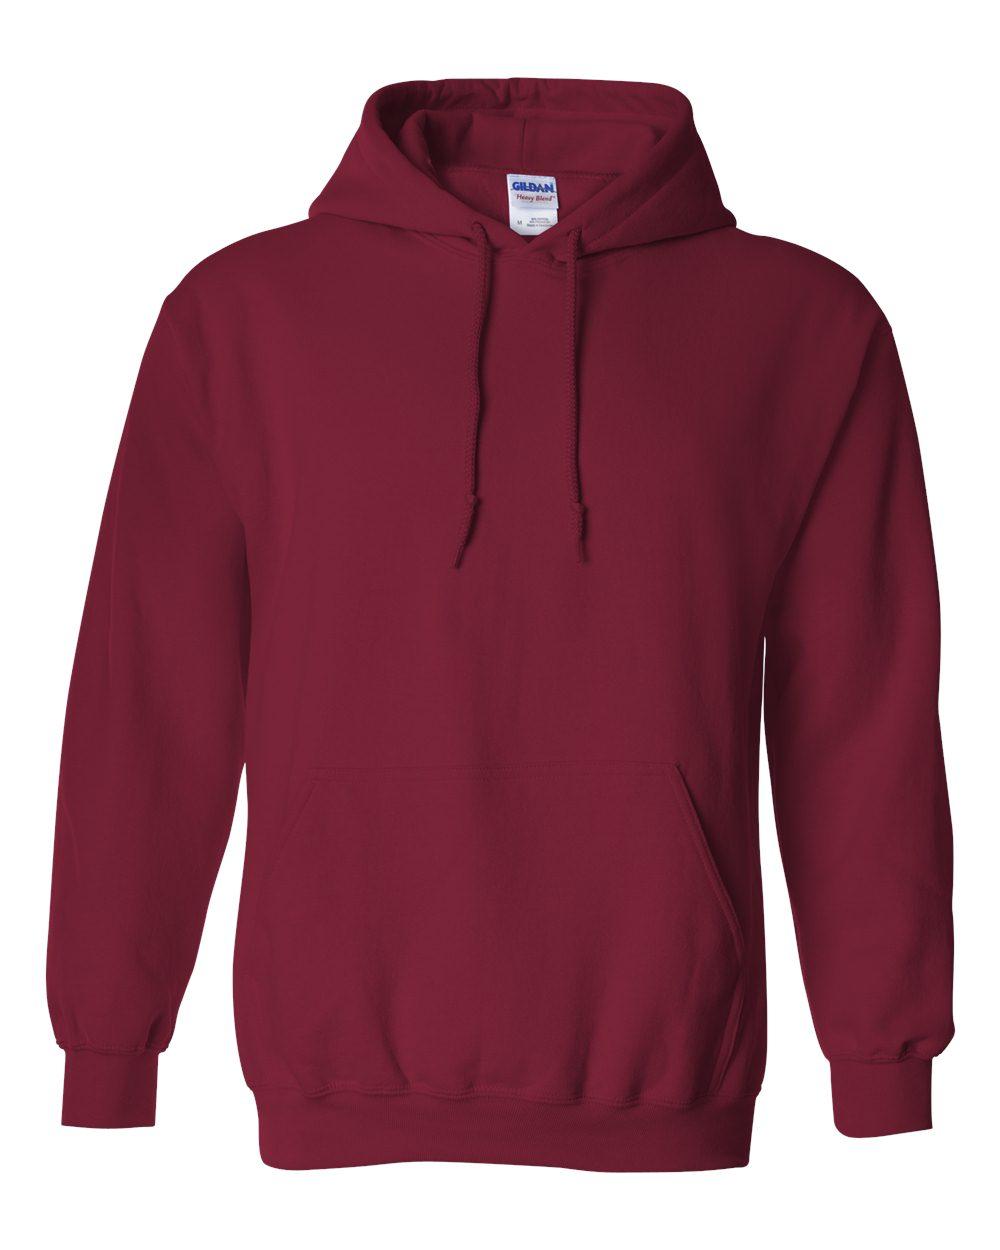 Gildan-Mens-Blank-Hoodie-Heavy-Blend-Hooded-Sweatshirt-Solid-18500-up-to-5XL thumbnail 12